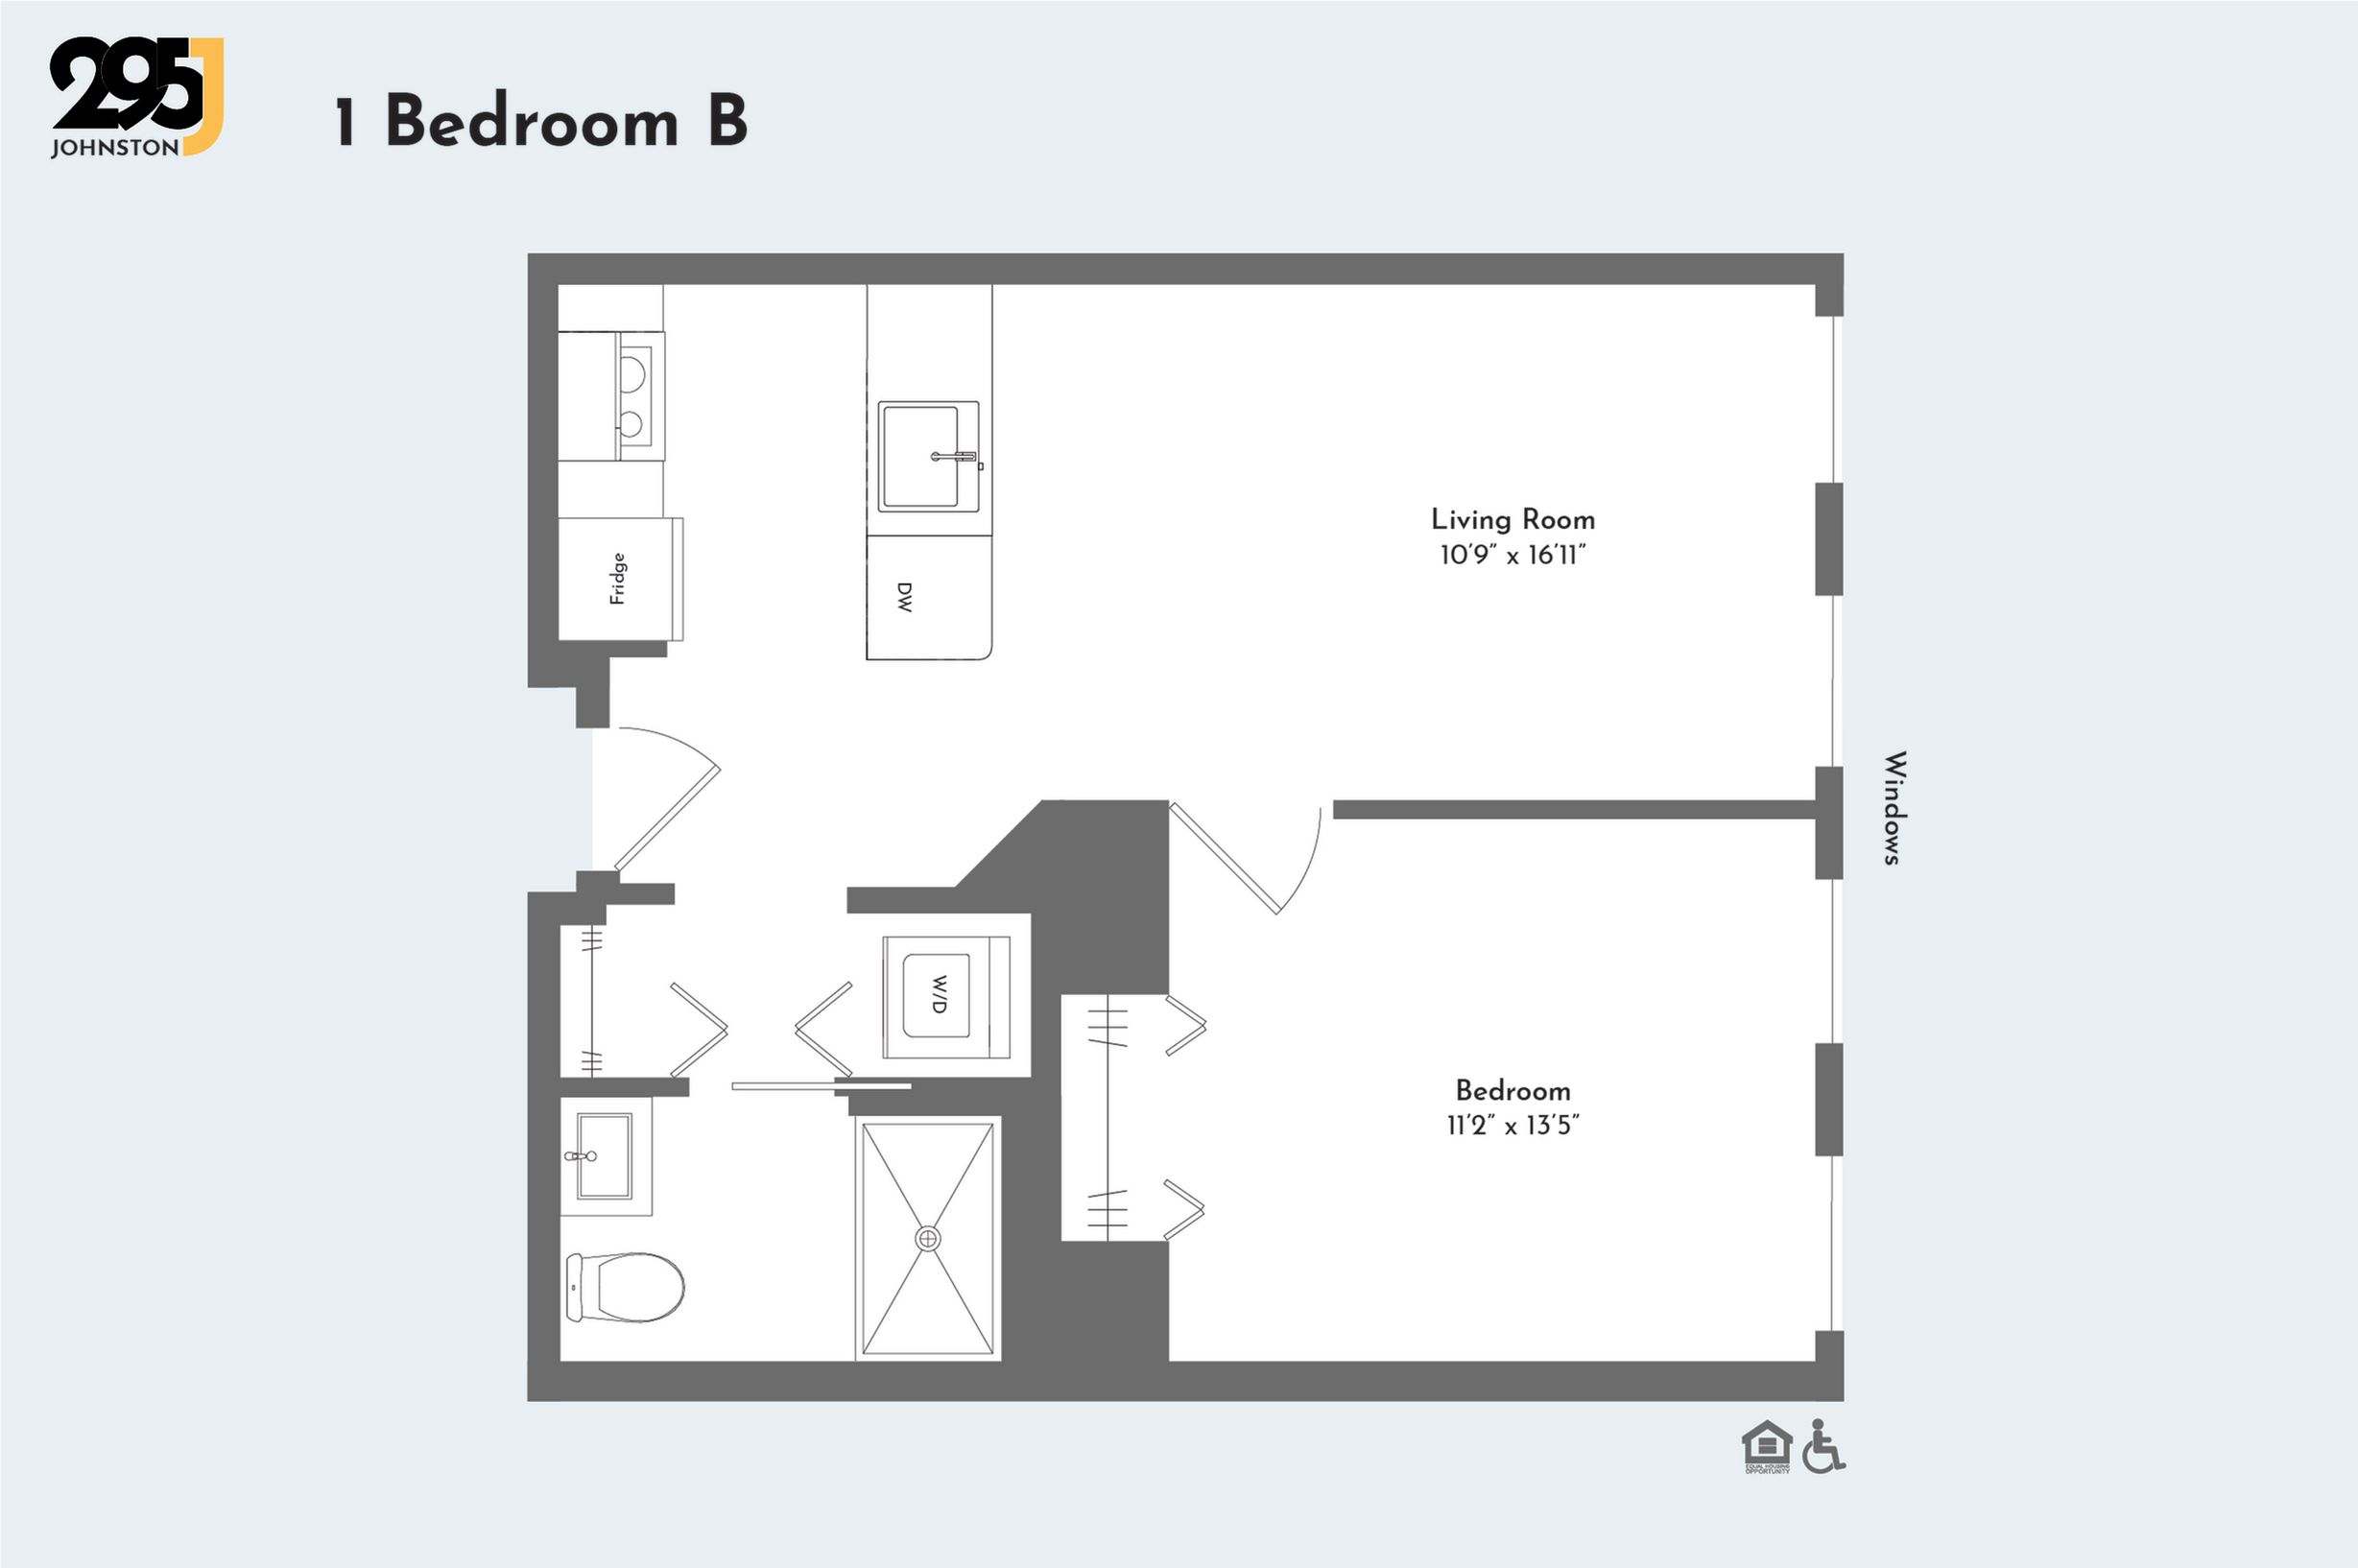 1 Bedroom B floorplan